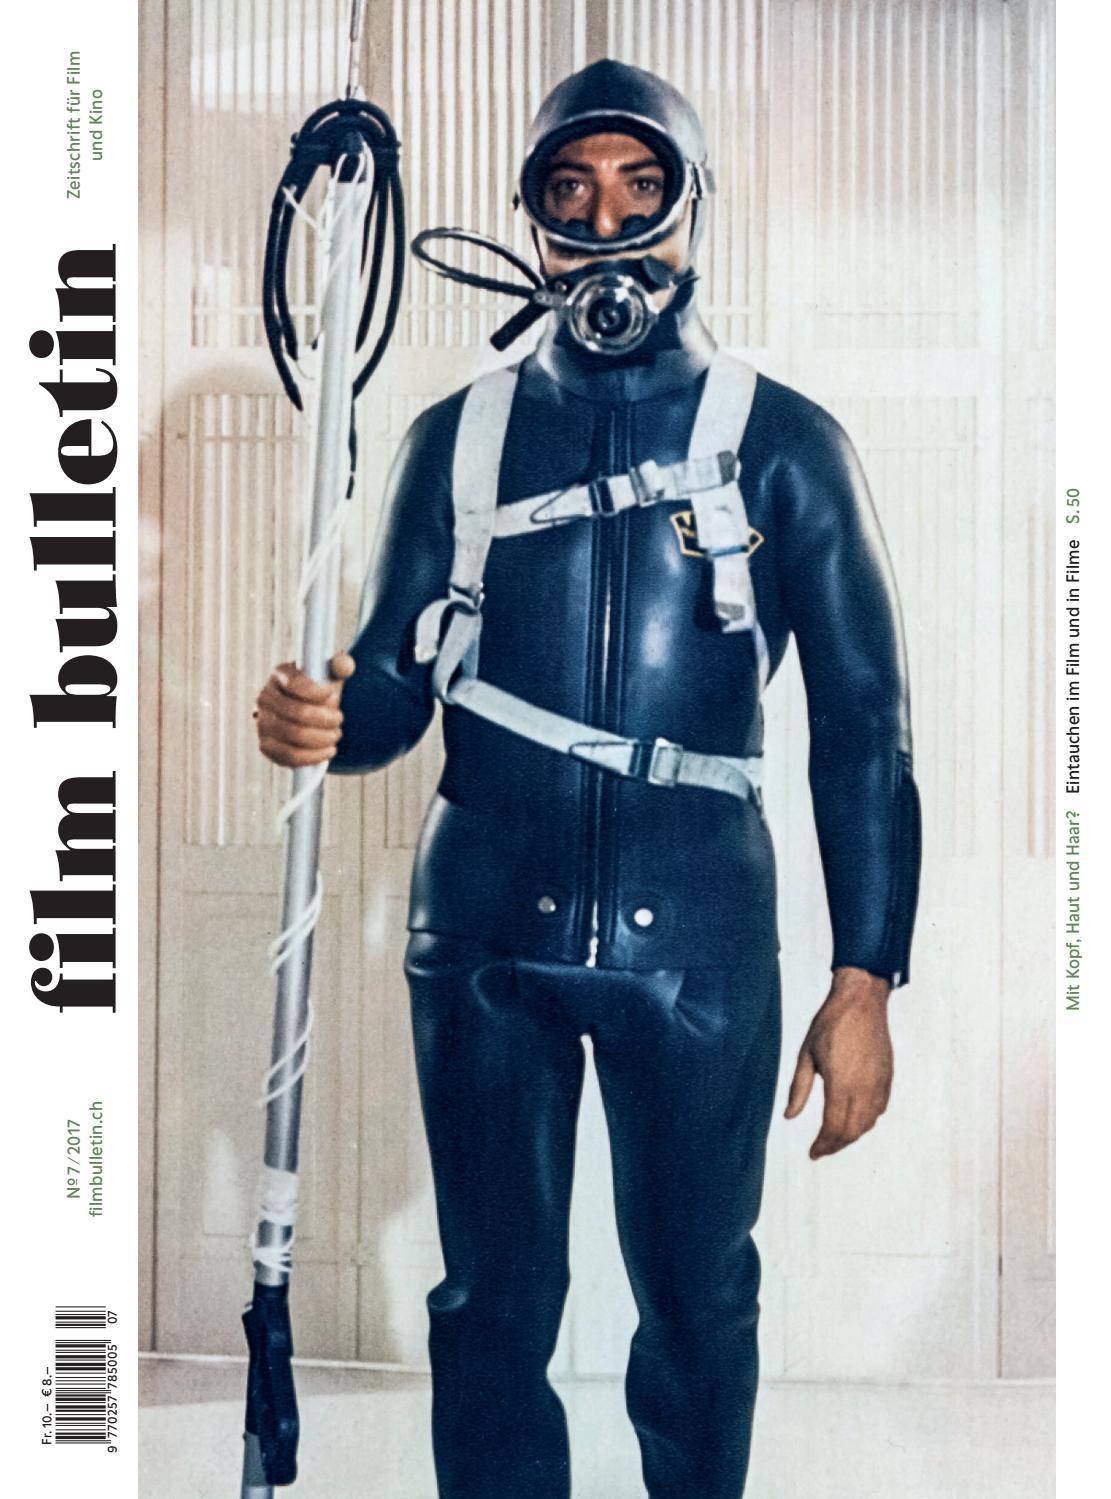 Filmbulletin 7/17: Gus Van Sant + Eintauchen By Filmbulletin concernant A 7 Ans Anne Sylvestre